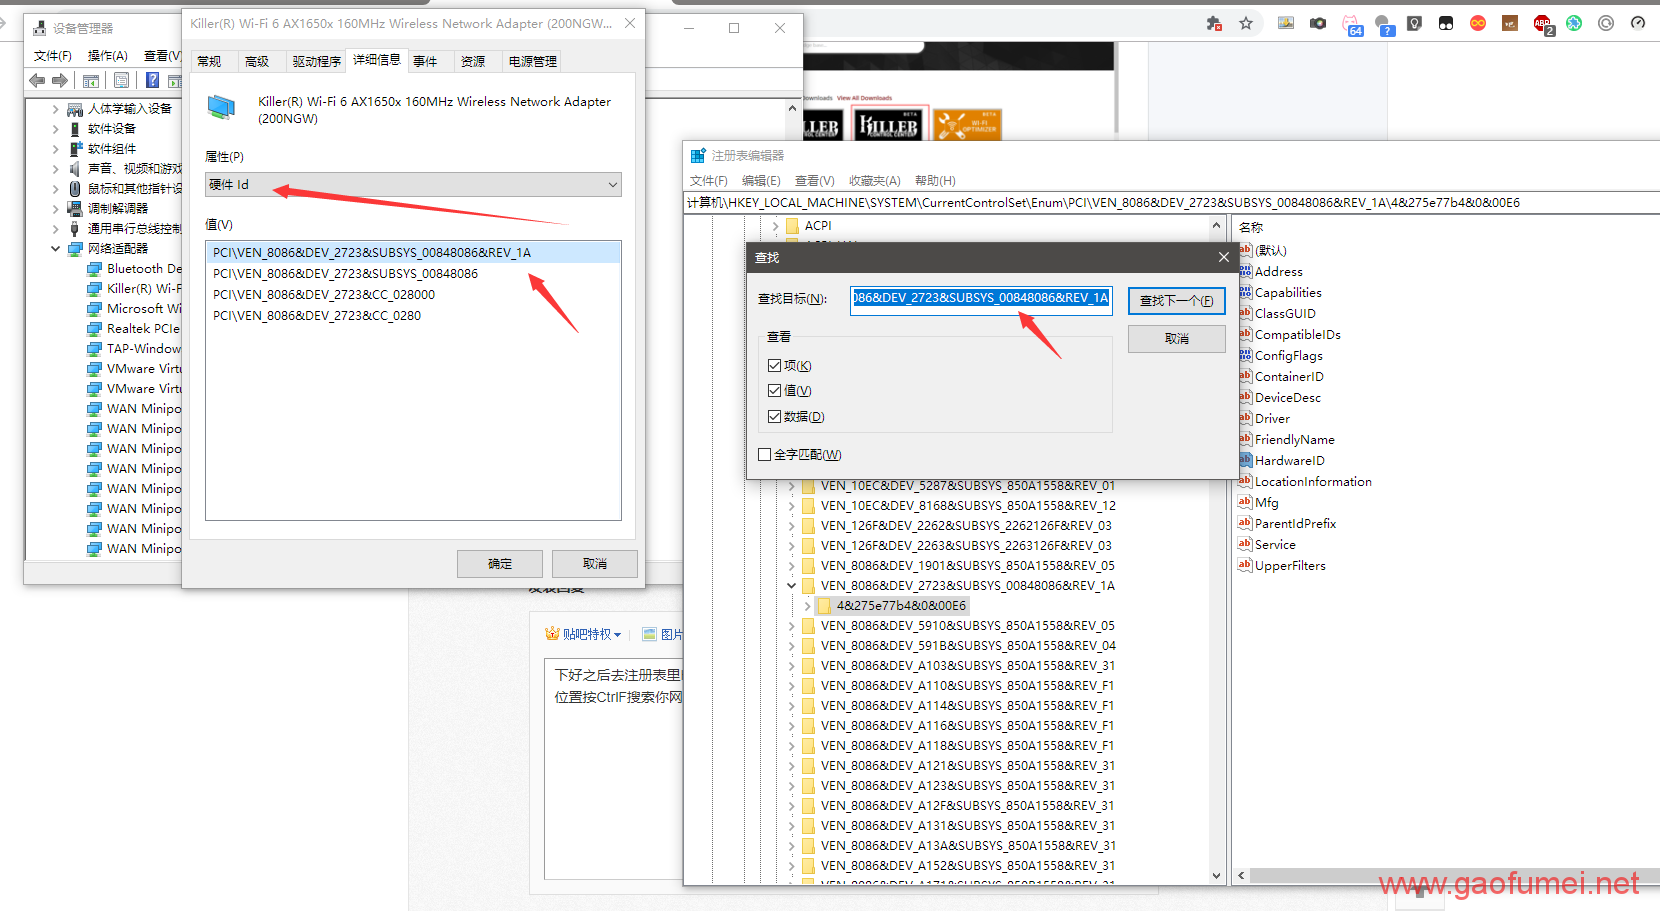 Intel AX200ngw(wifi5属性的网卡)刷成微星 killer AX1650X(wifi6)的属性的方法(无线网卡刷固件)分享 硬件问题 第2张-泥人传说